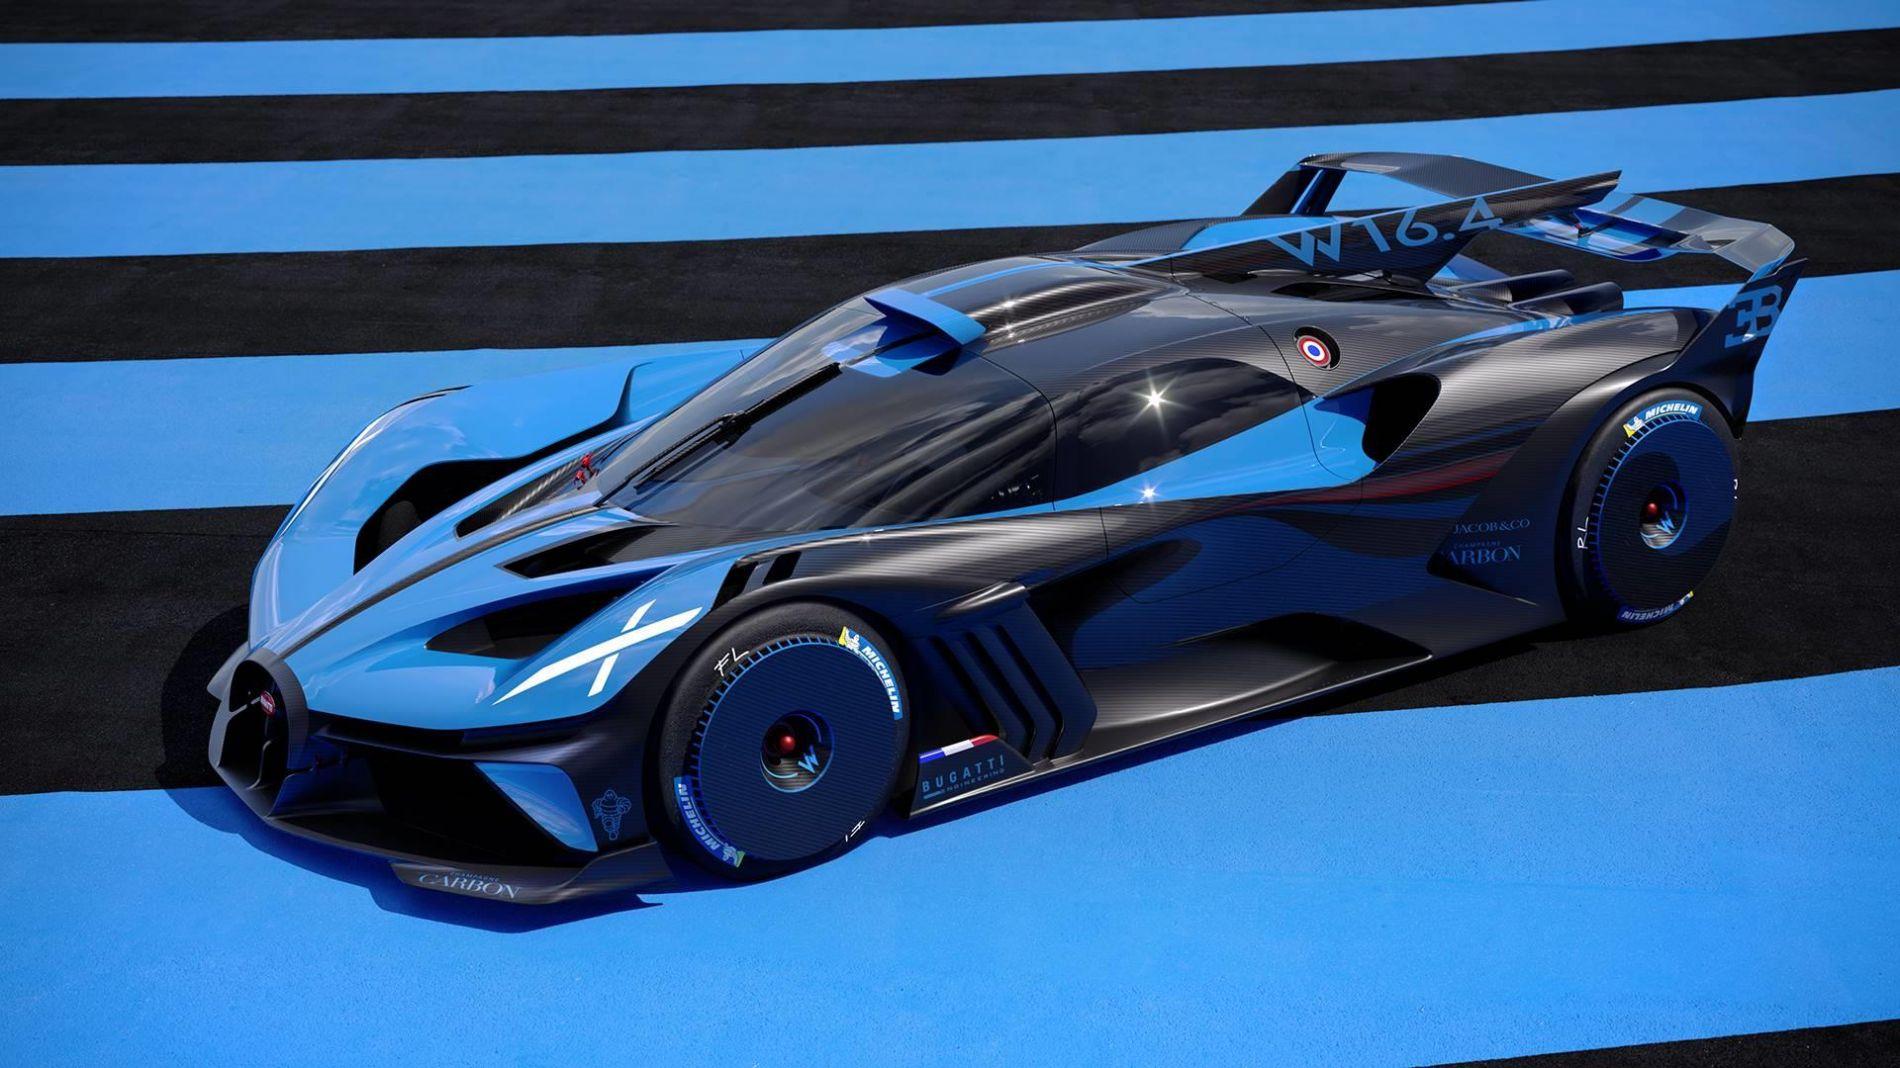 Bugatti-ის მორიგი სრულყოფილება